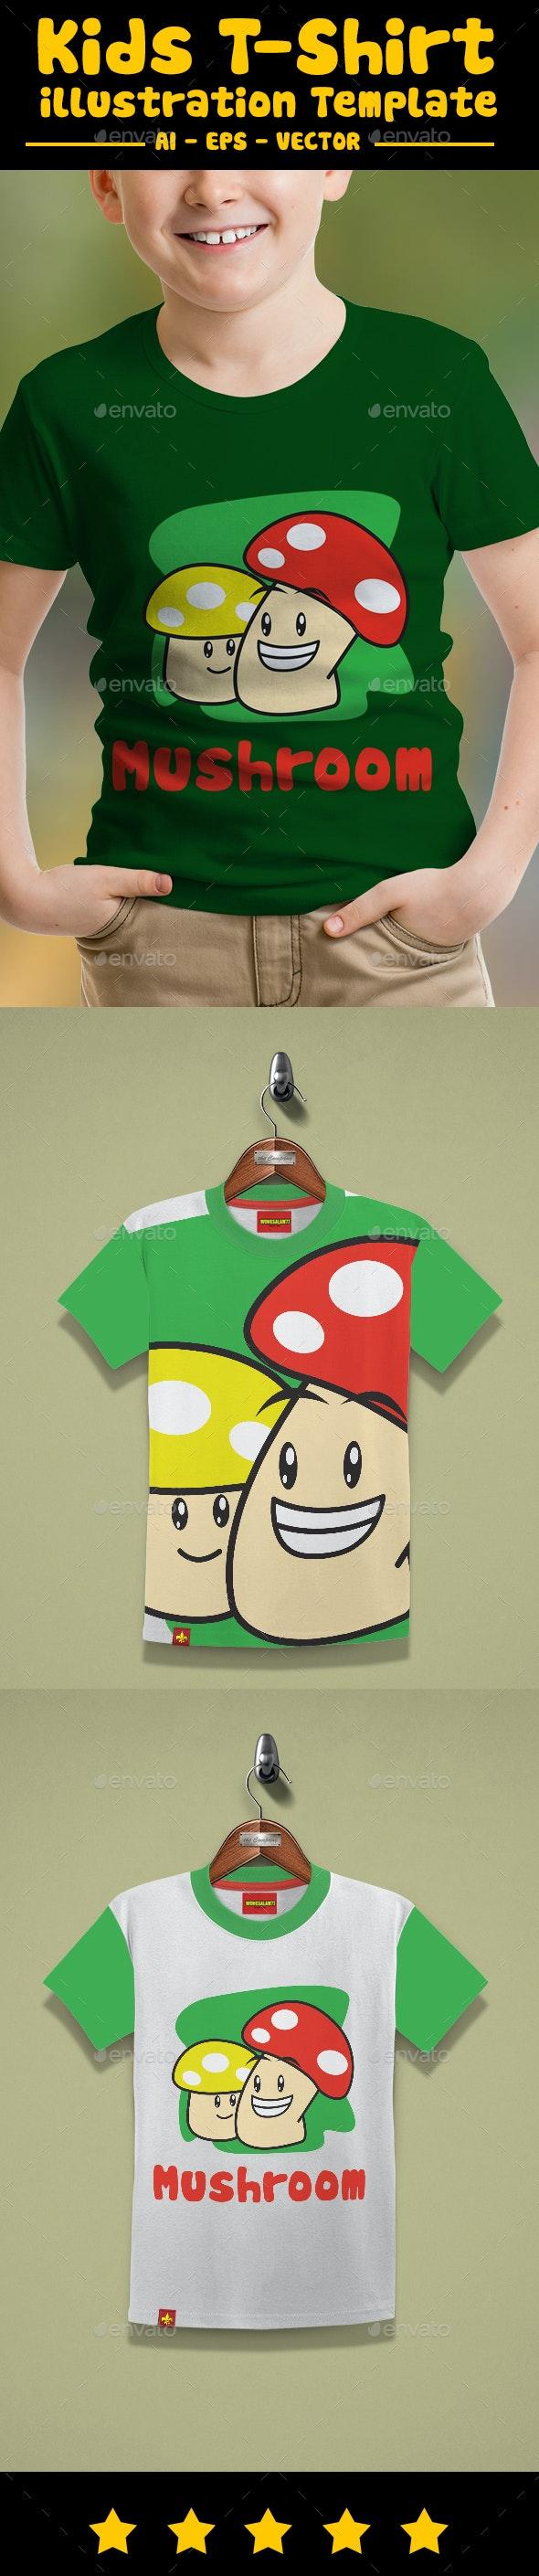 Mushroom Kids T-Shirt Design - T-Shirts